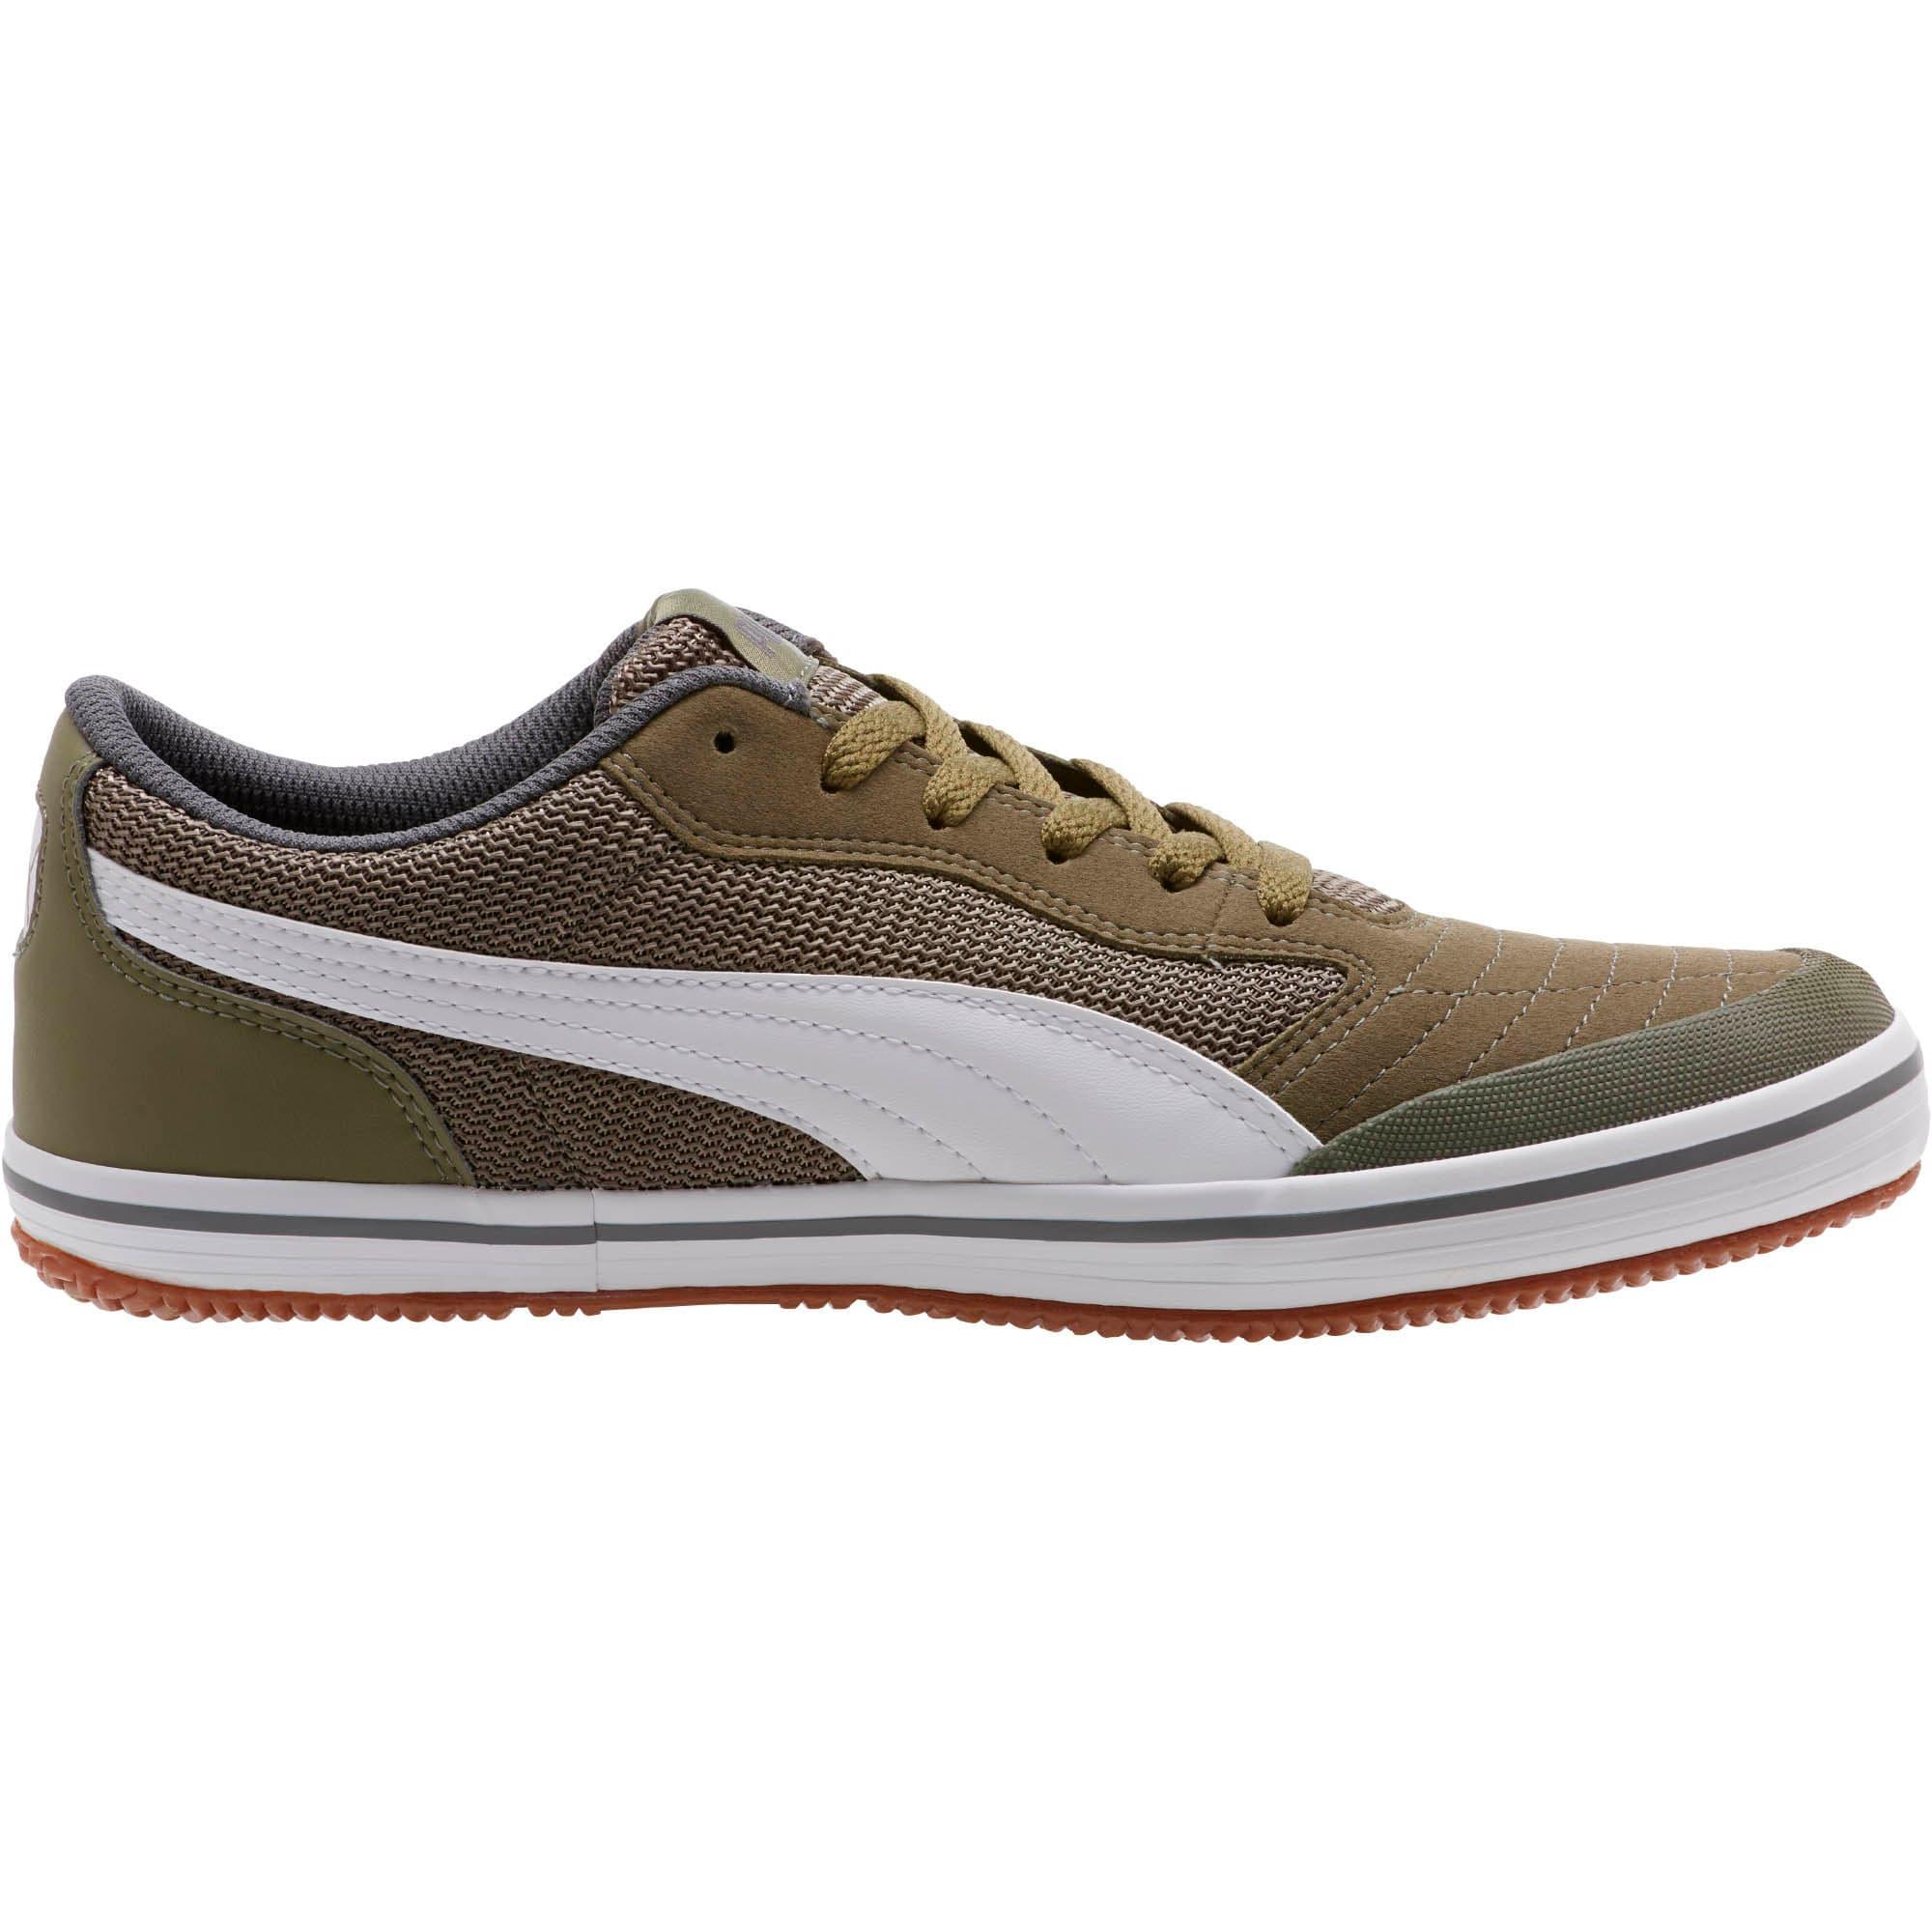 Thumbnail 3 of Astro Sala Sneakers, Burnt Olive-Puma White, medium